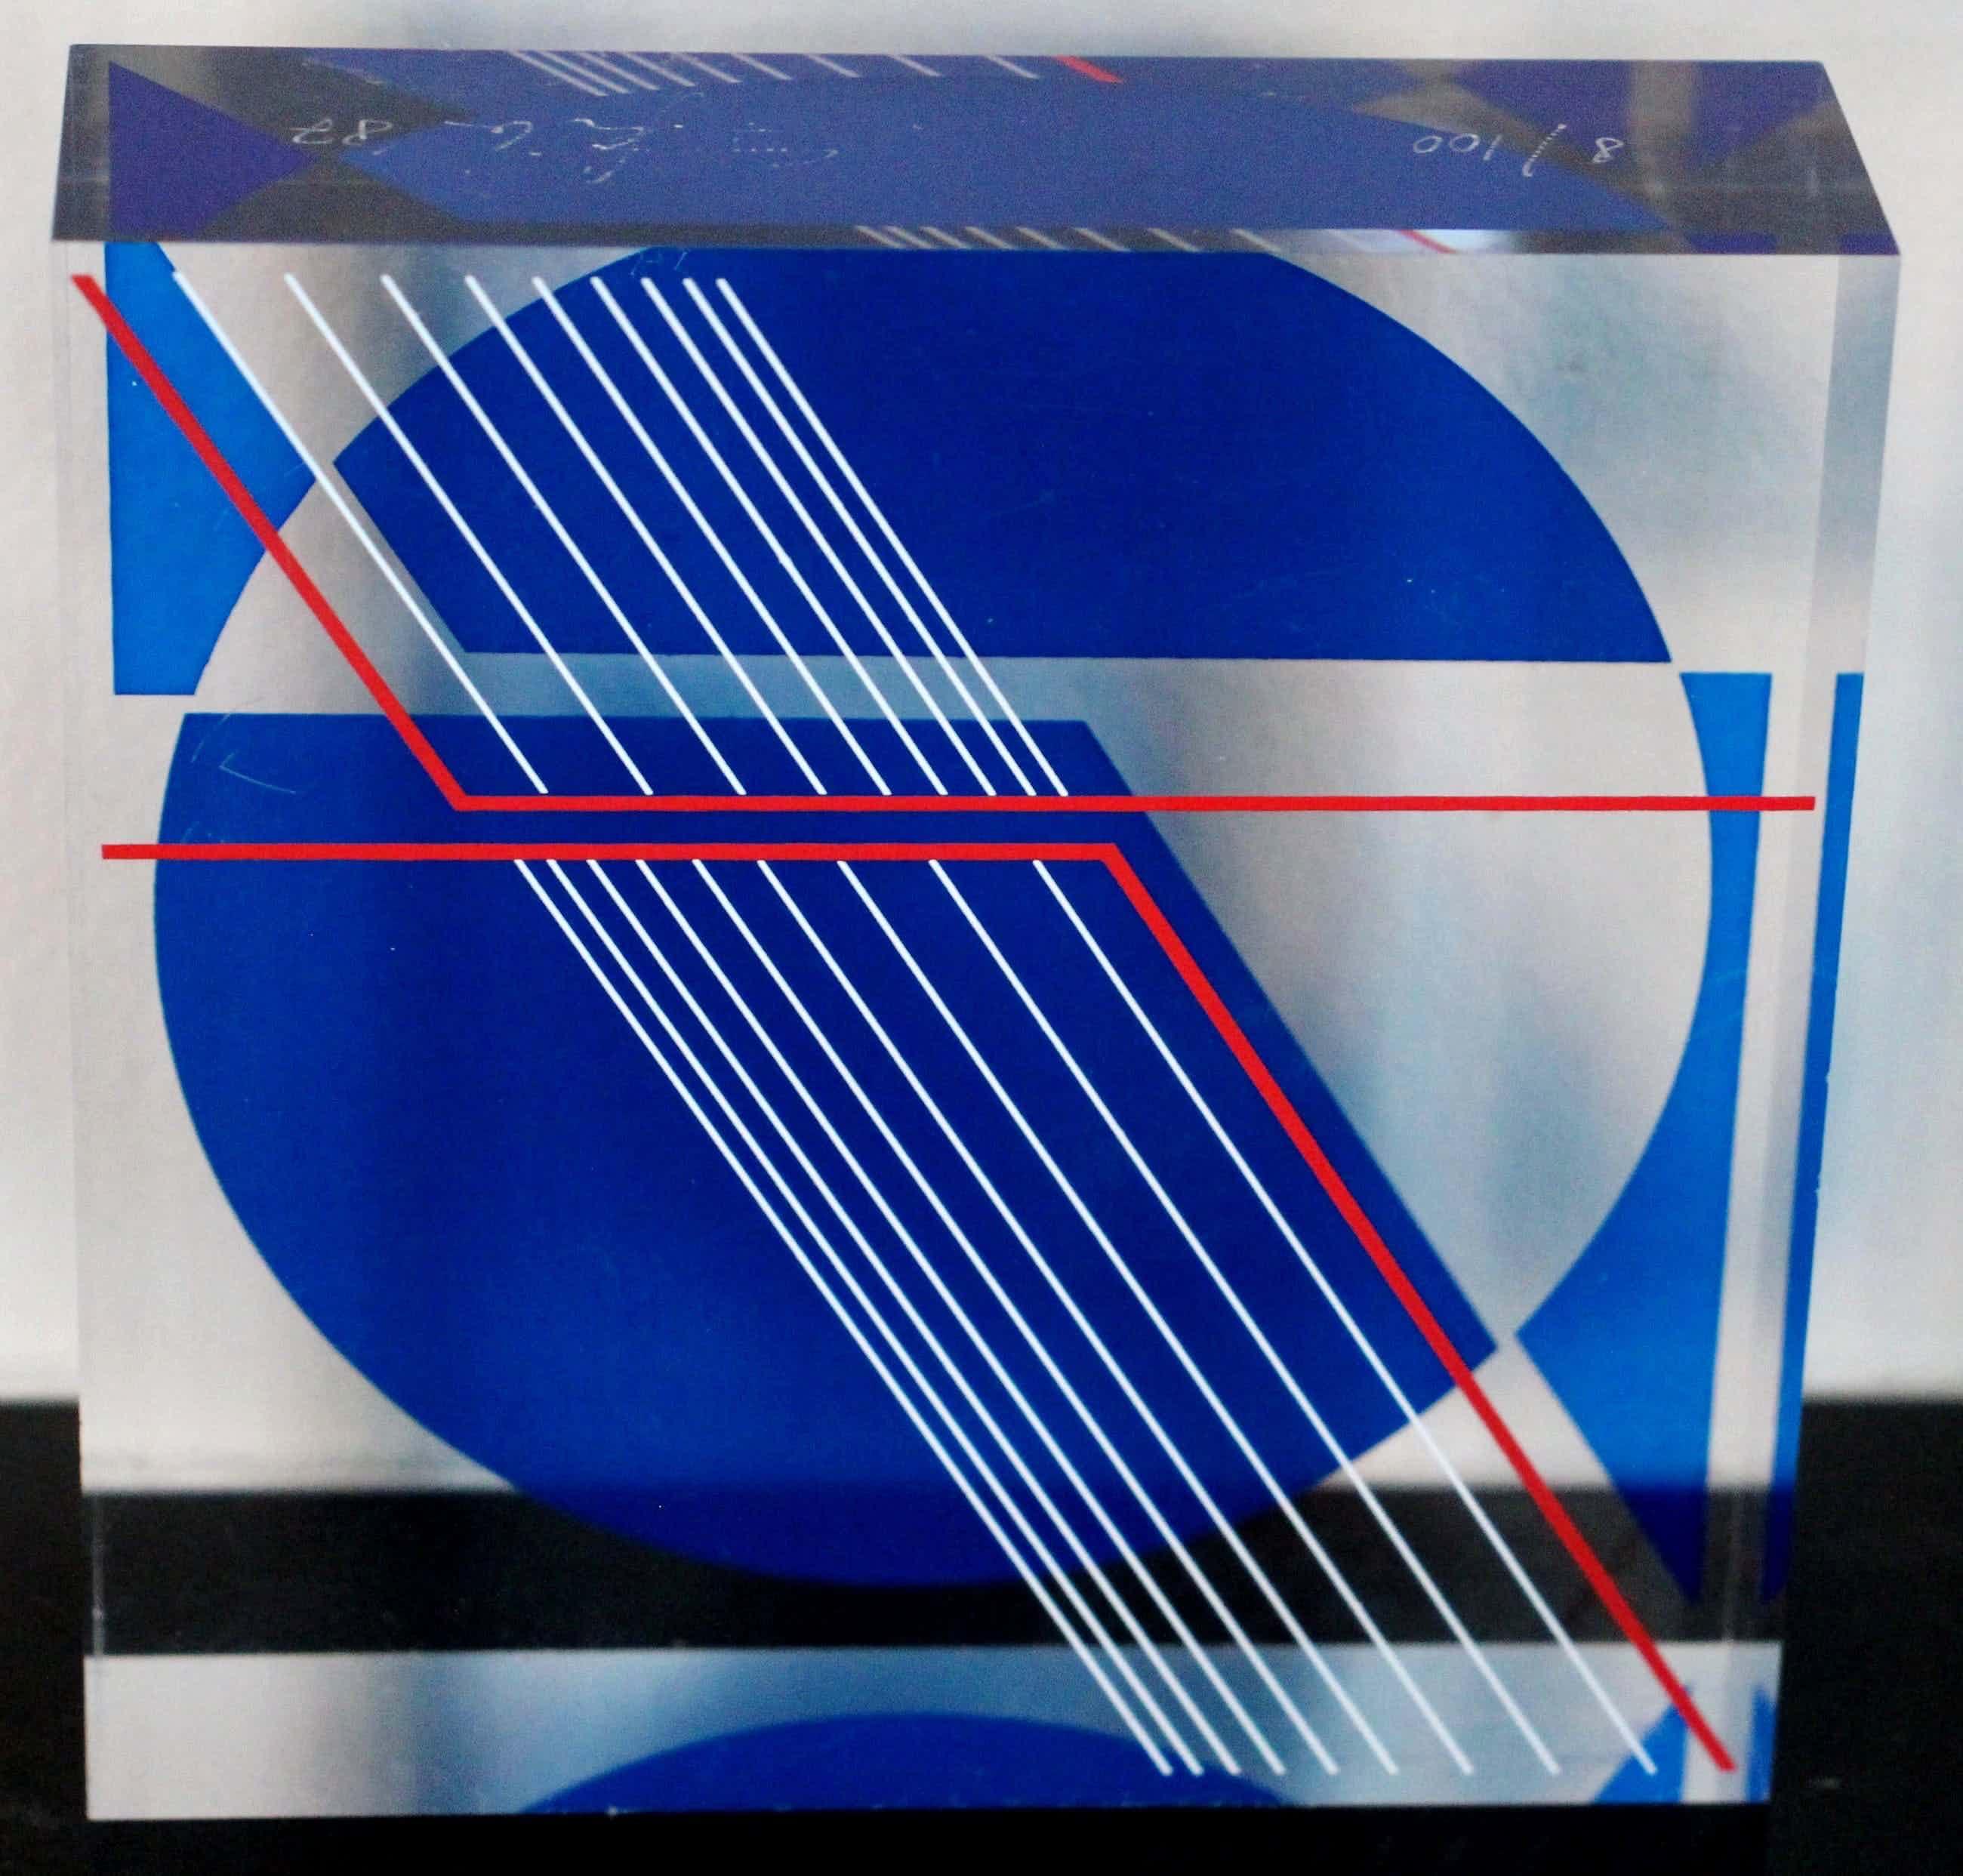 Friedrich Geiler - Gesigneerde en genummerde sculptuur van plexiglas kopen? Bied vanaf 250!